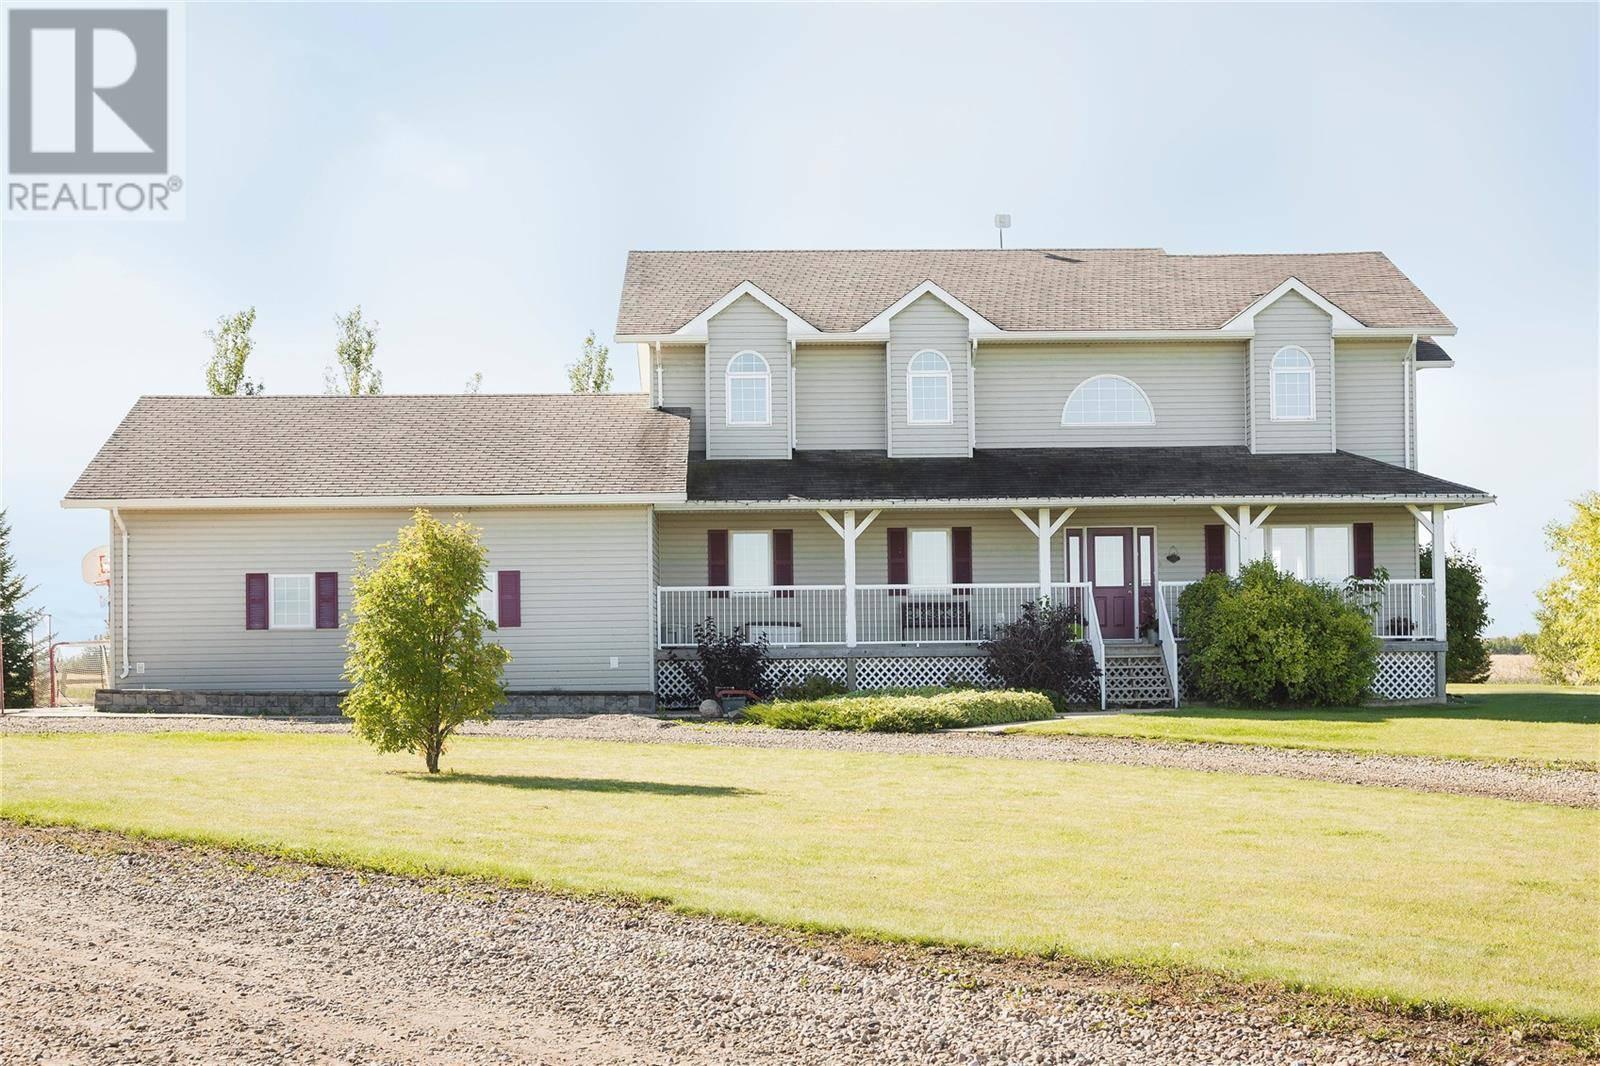 House for sale at  River Rd Prince Albert Rm No. 461 Saskatchewan - MLS: SK786664